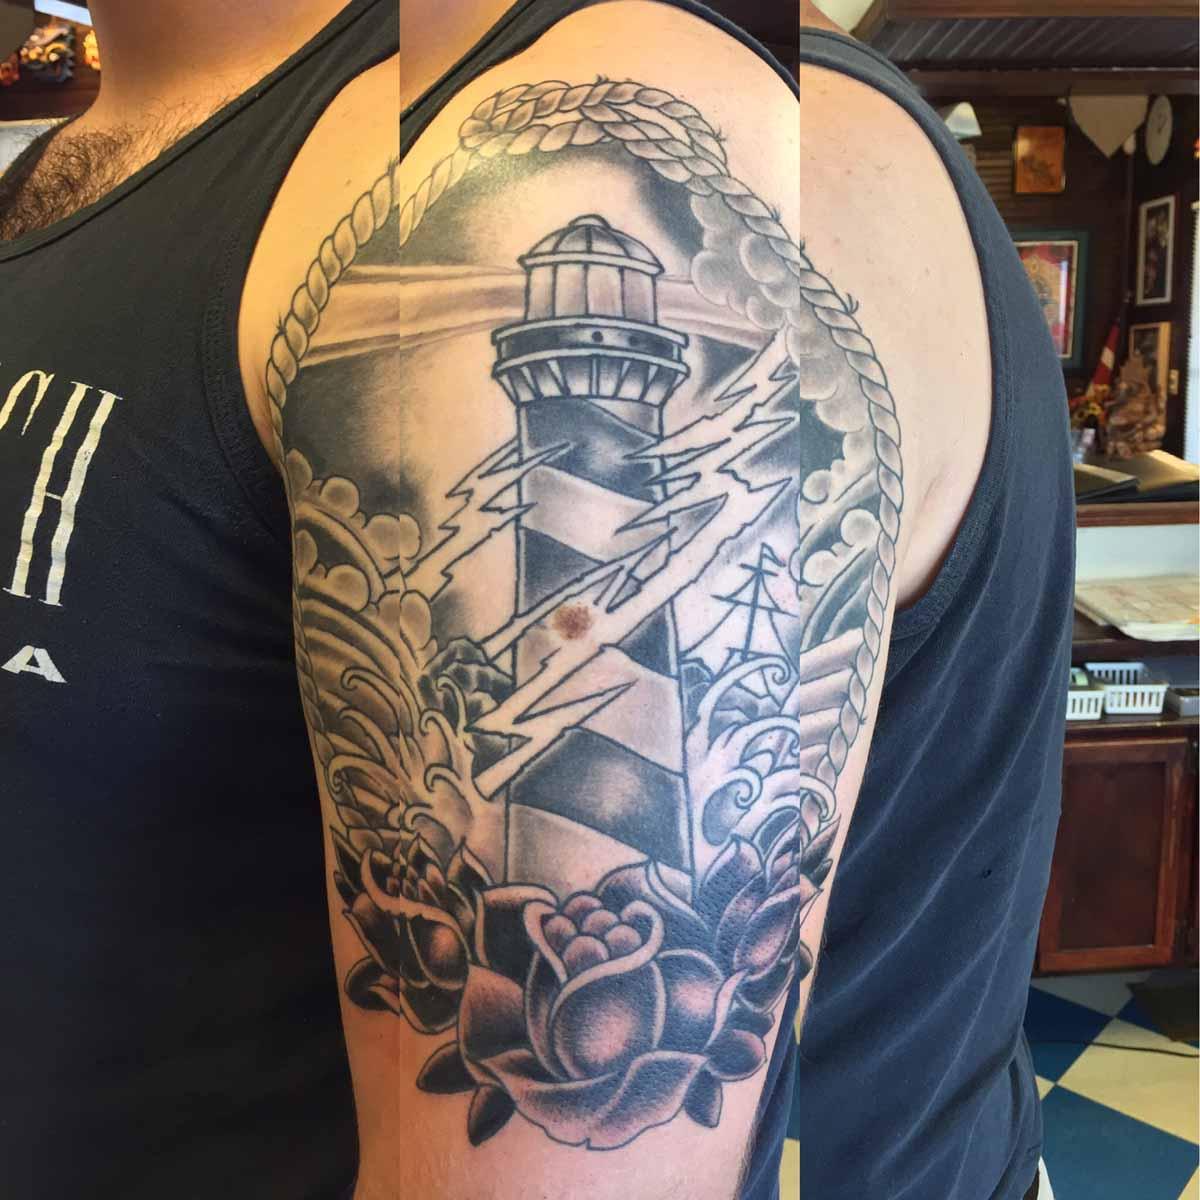 Tattoo Artist Alex Wilson Against The Grain Tattoo